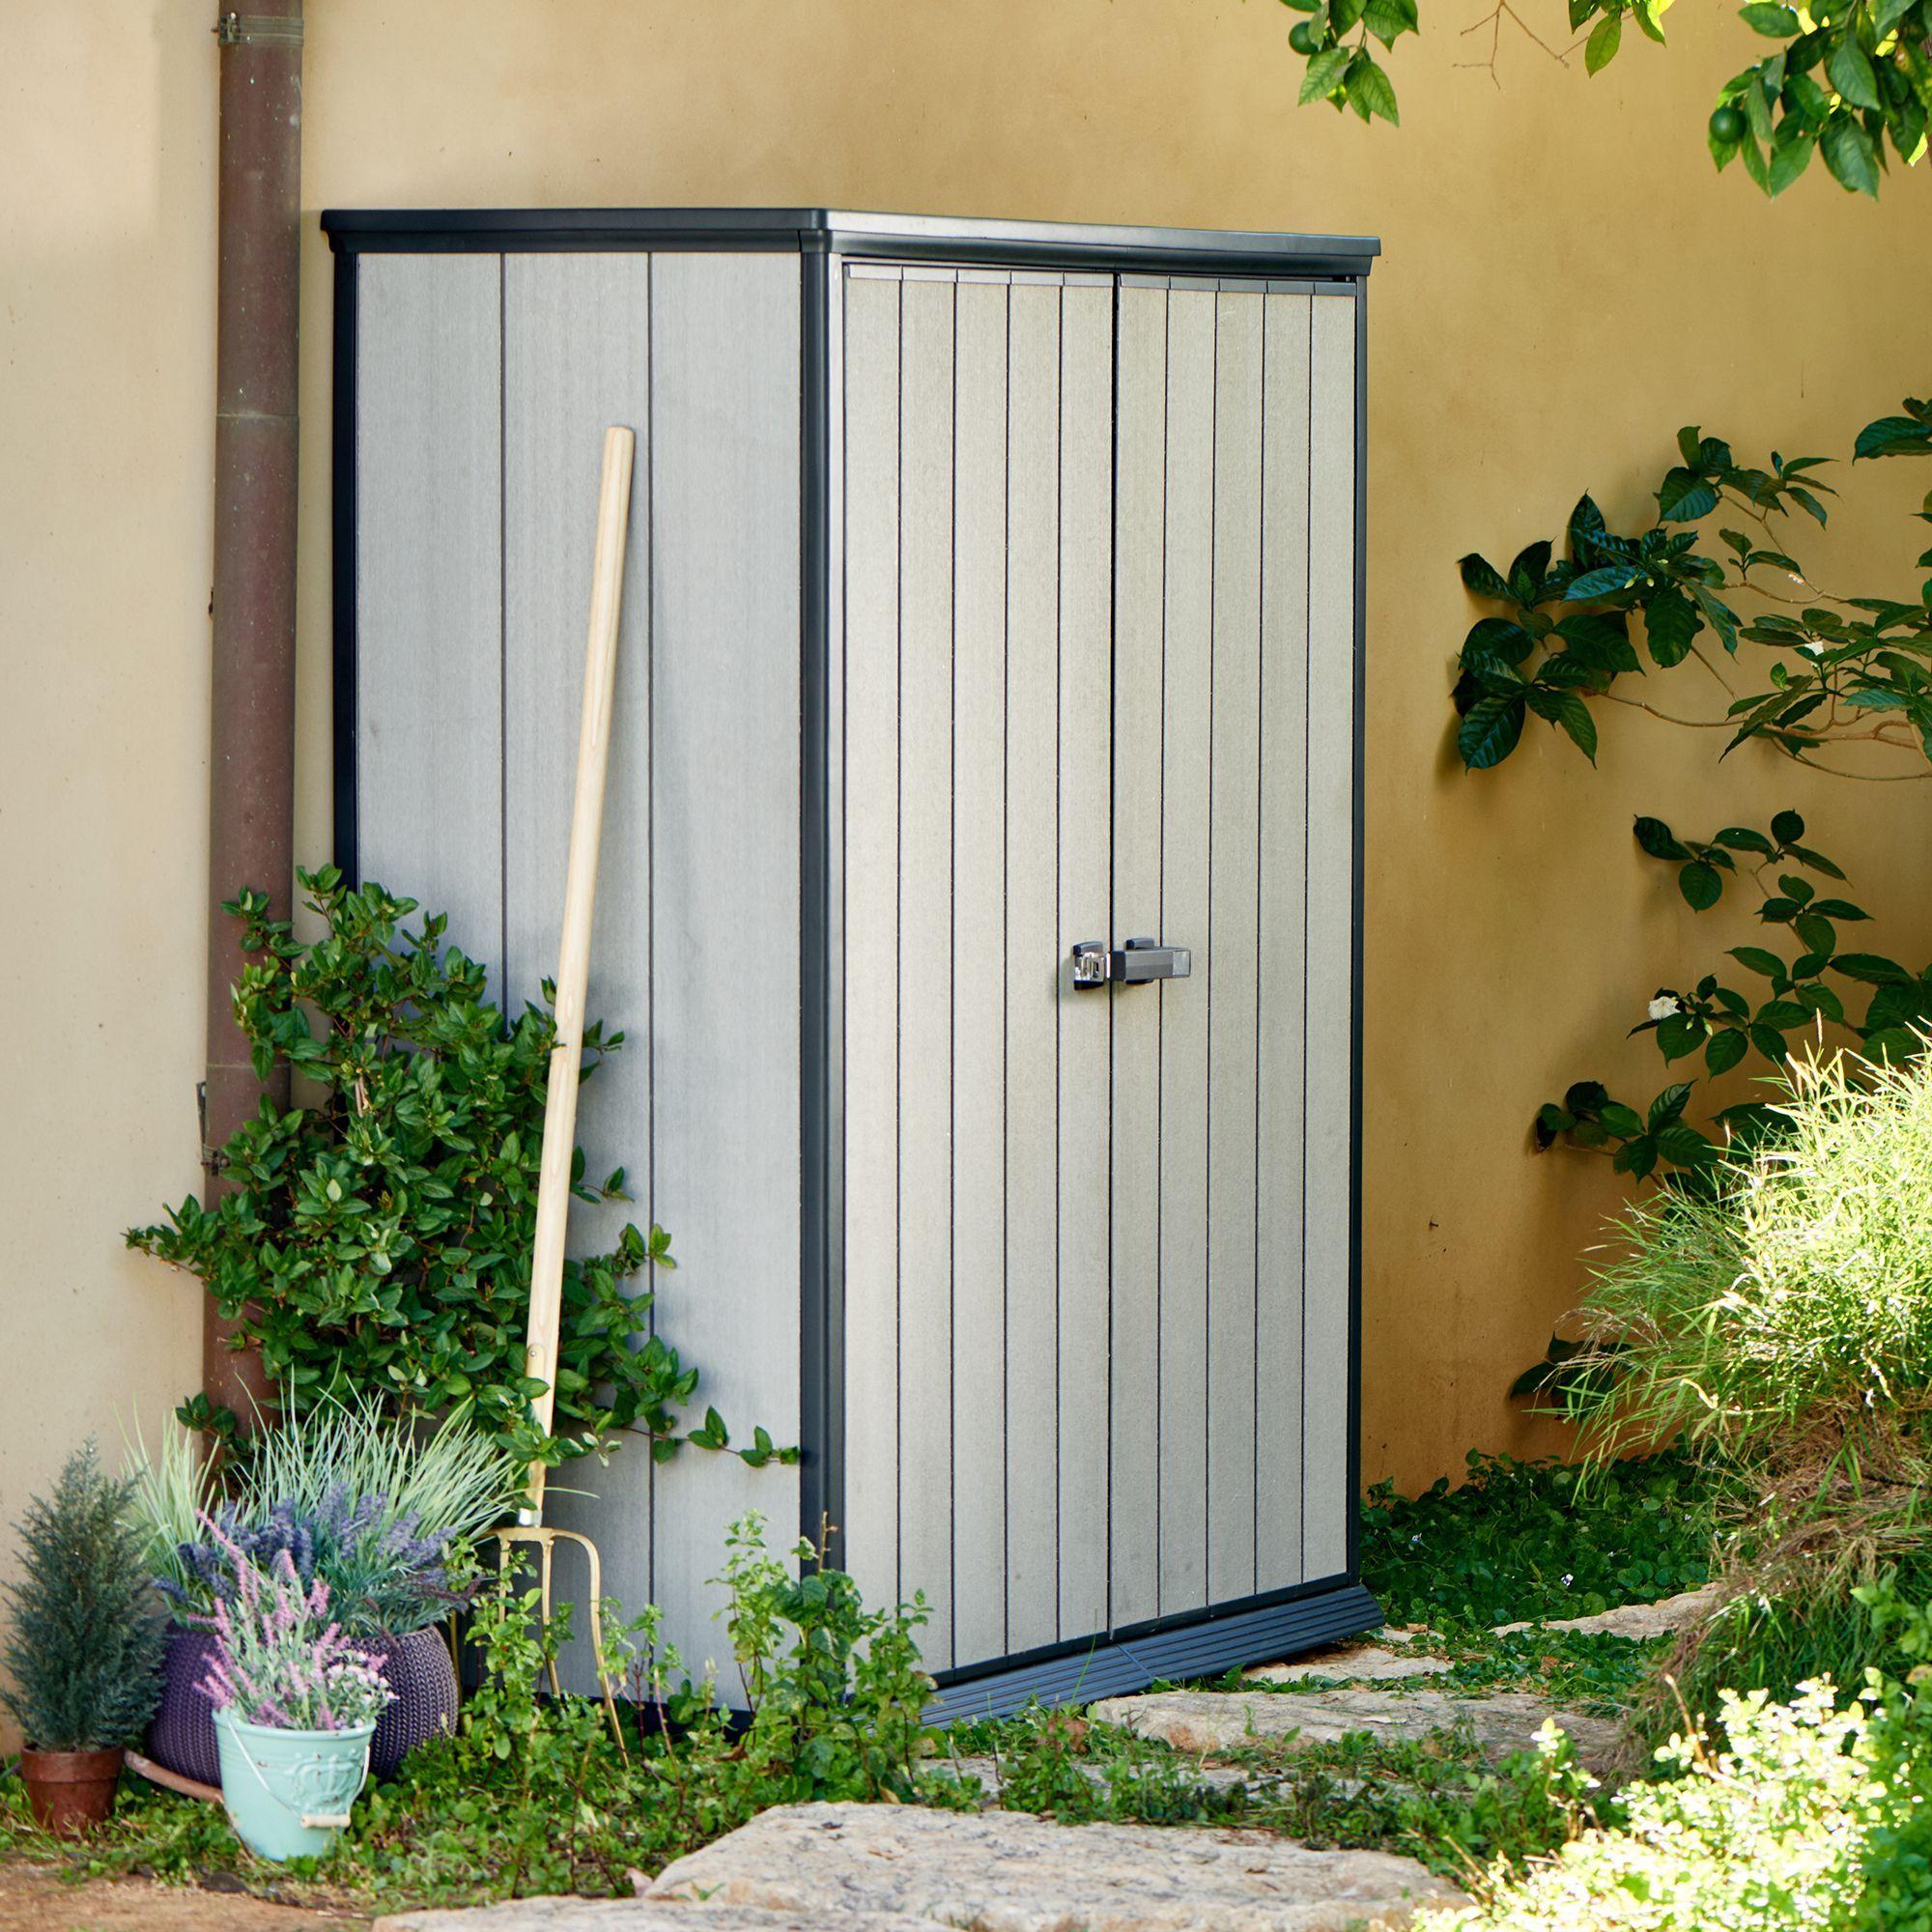 6x2 oakland high store plastic tall cabinet - Garden Sheds 6 X 2